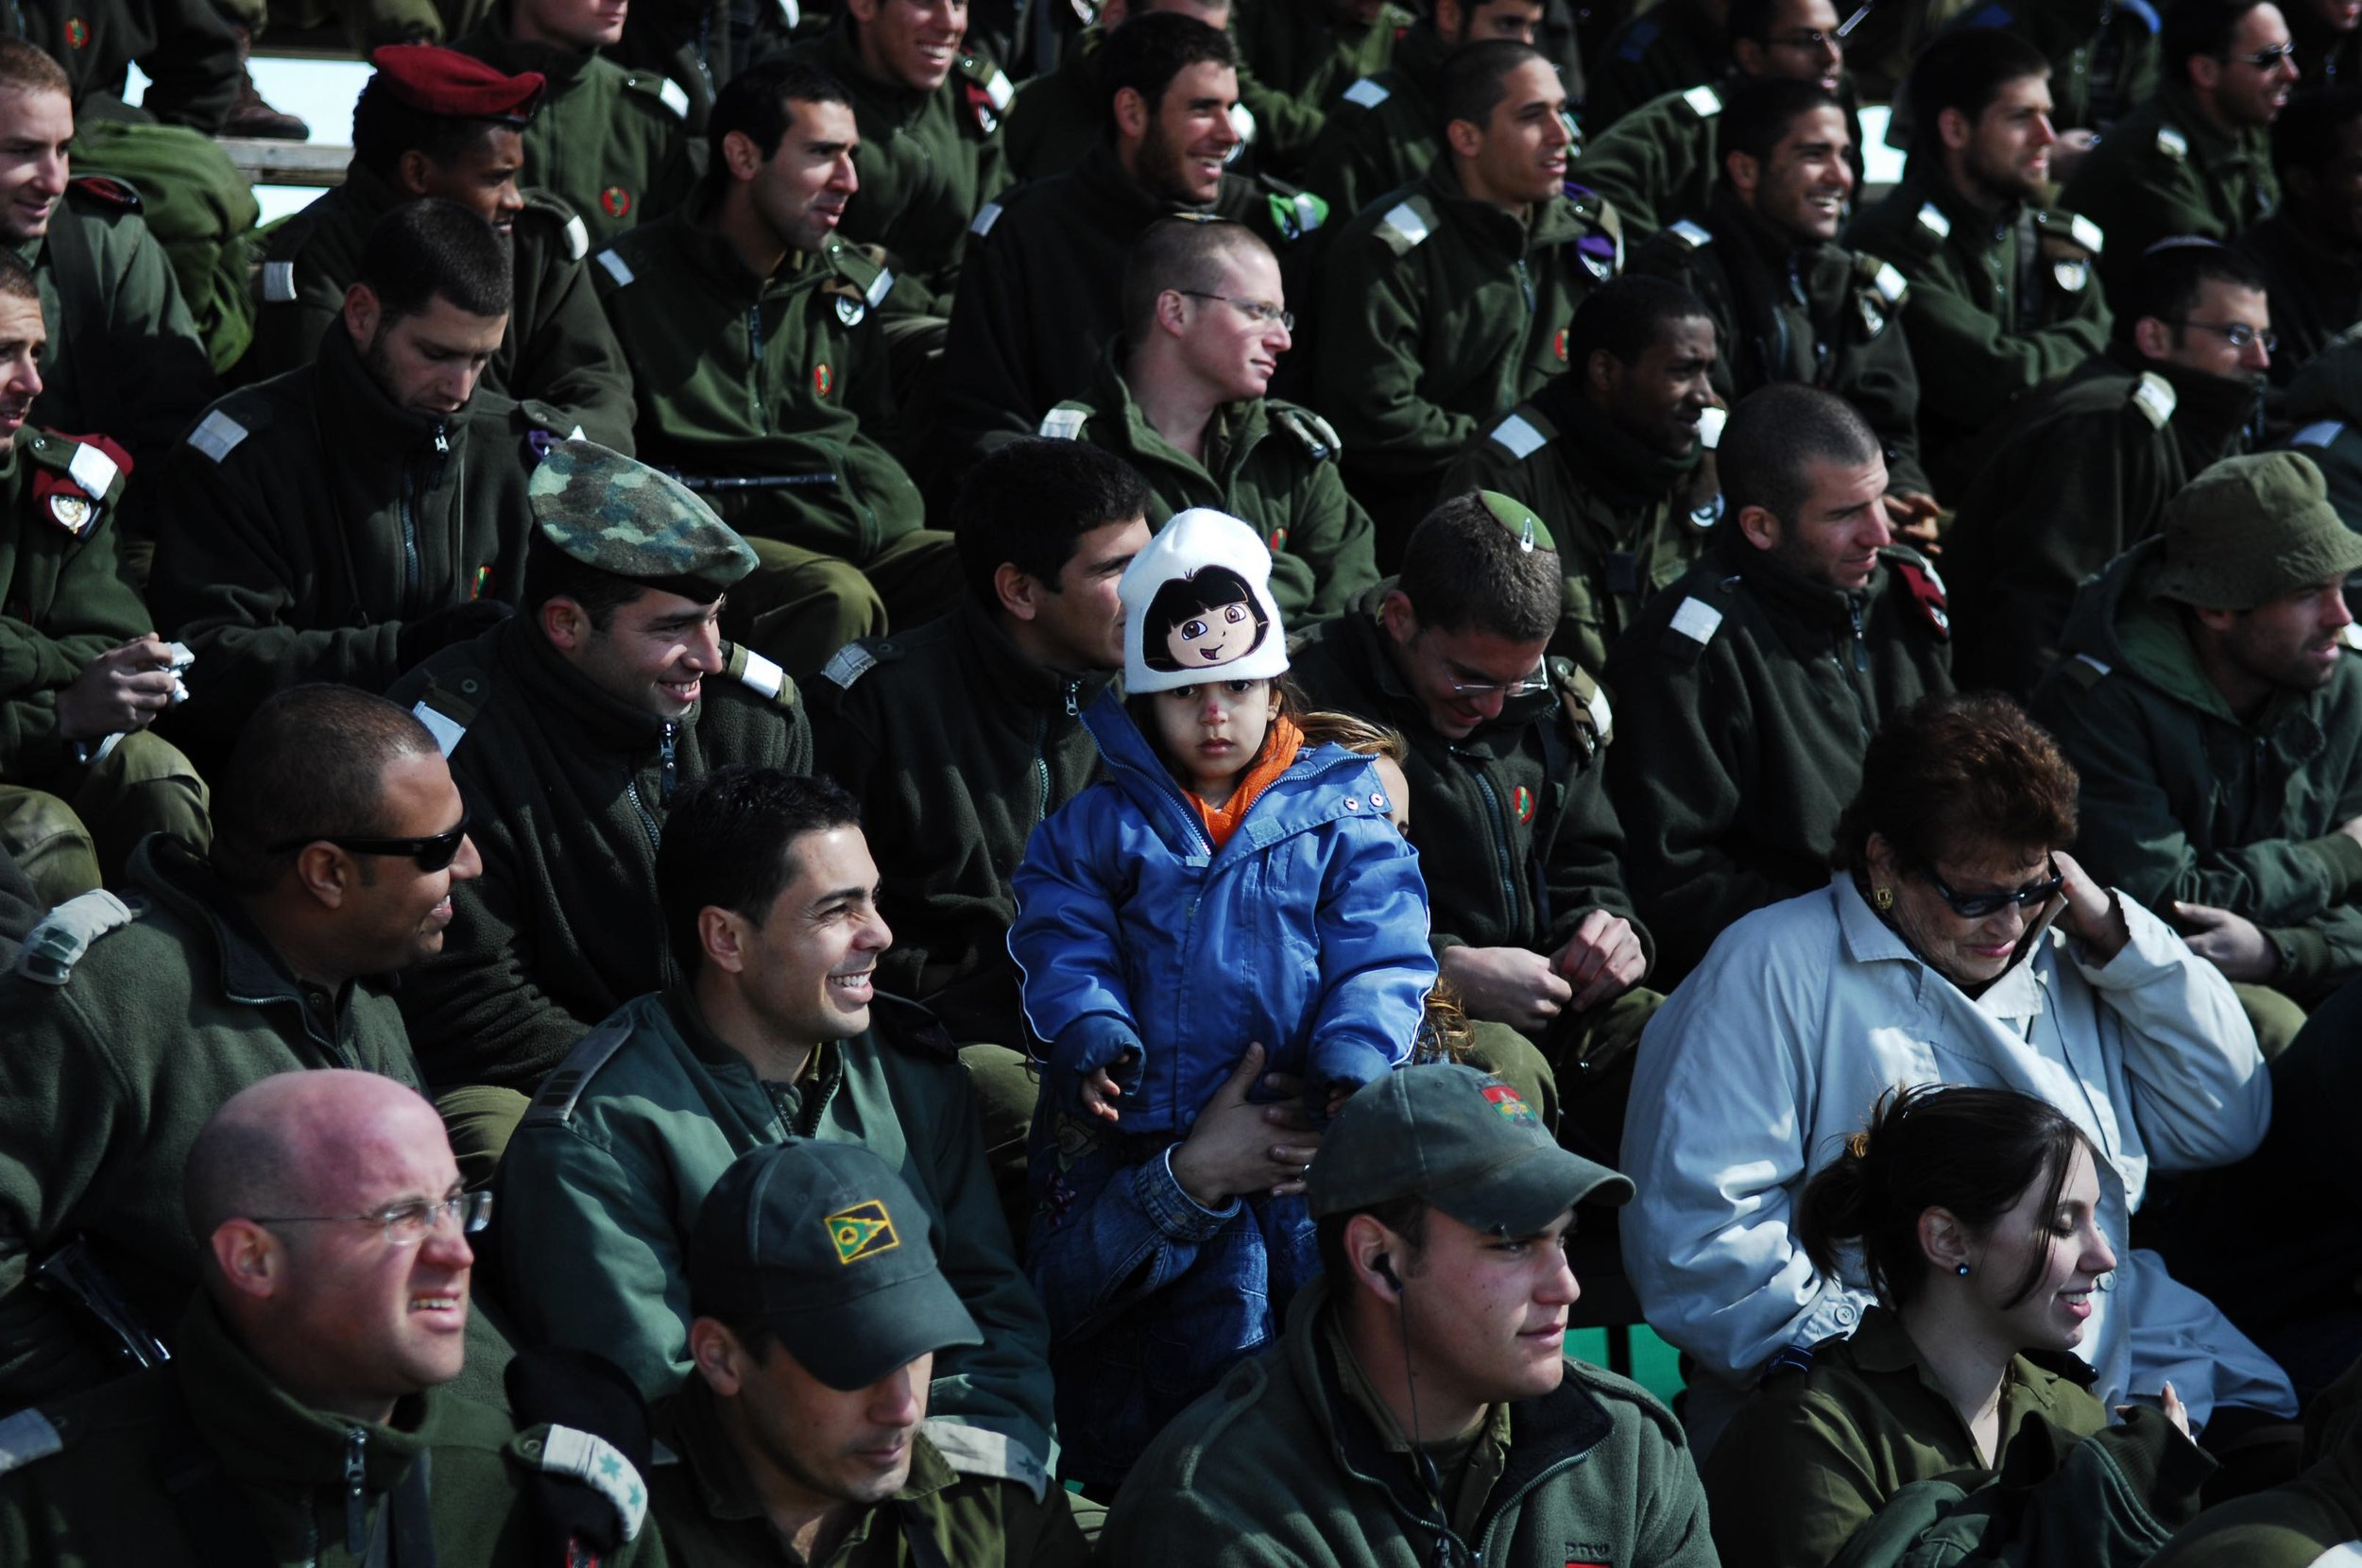 Military ceremony / Israel 2005